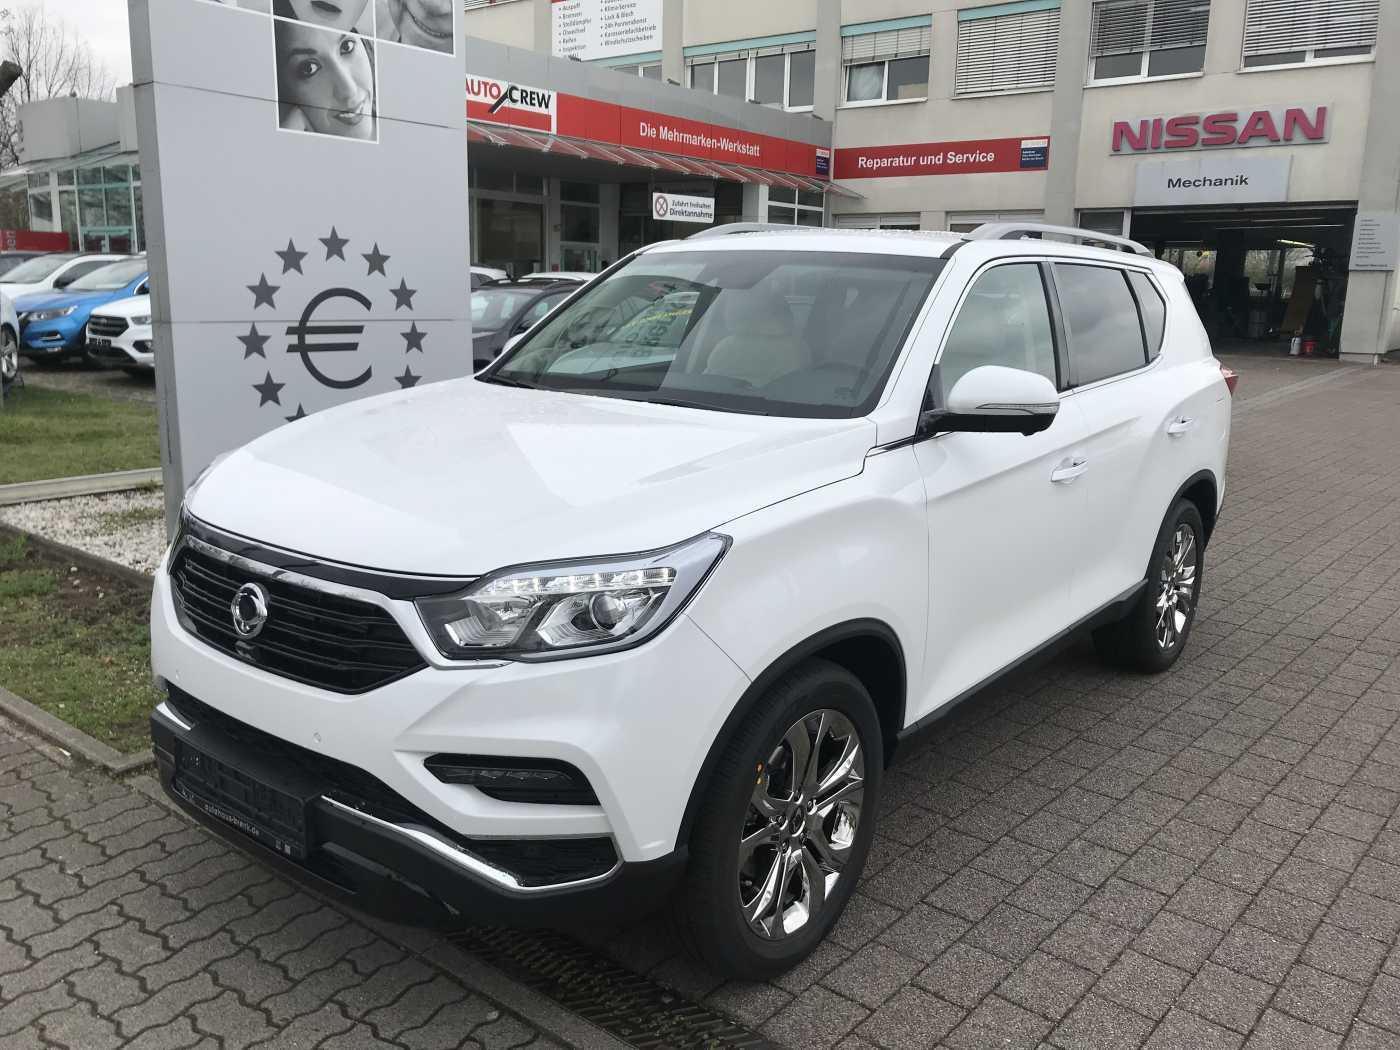 Ssangyong Rexton 2.2 e-XDi 4WD Aut. Noblesse*NAPPA White*, Jahr 2019, Diesel